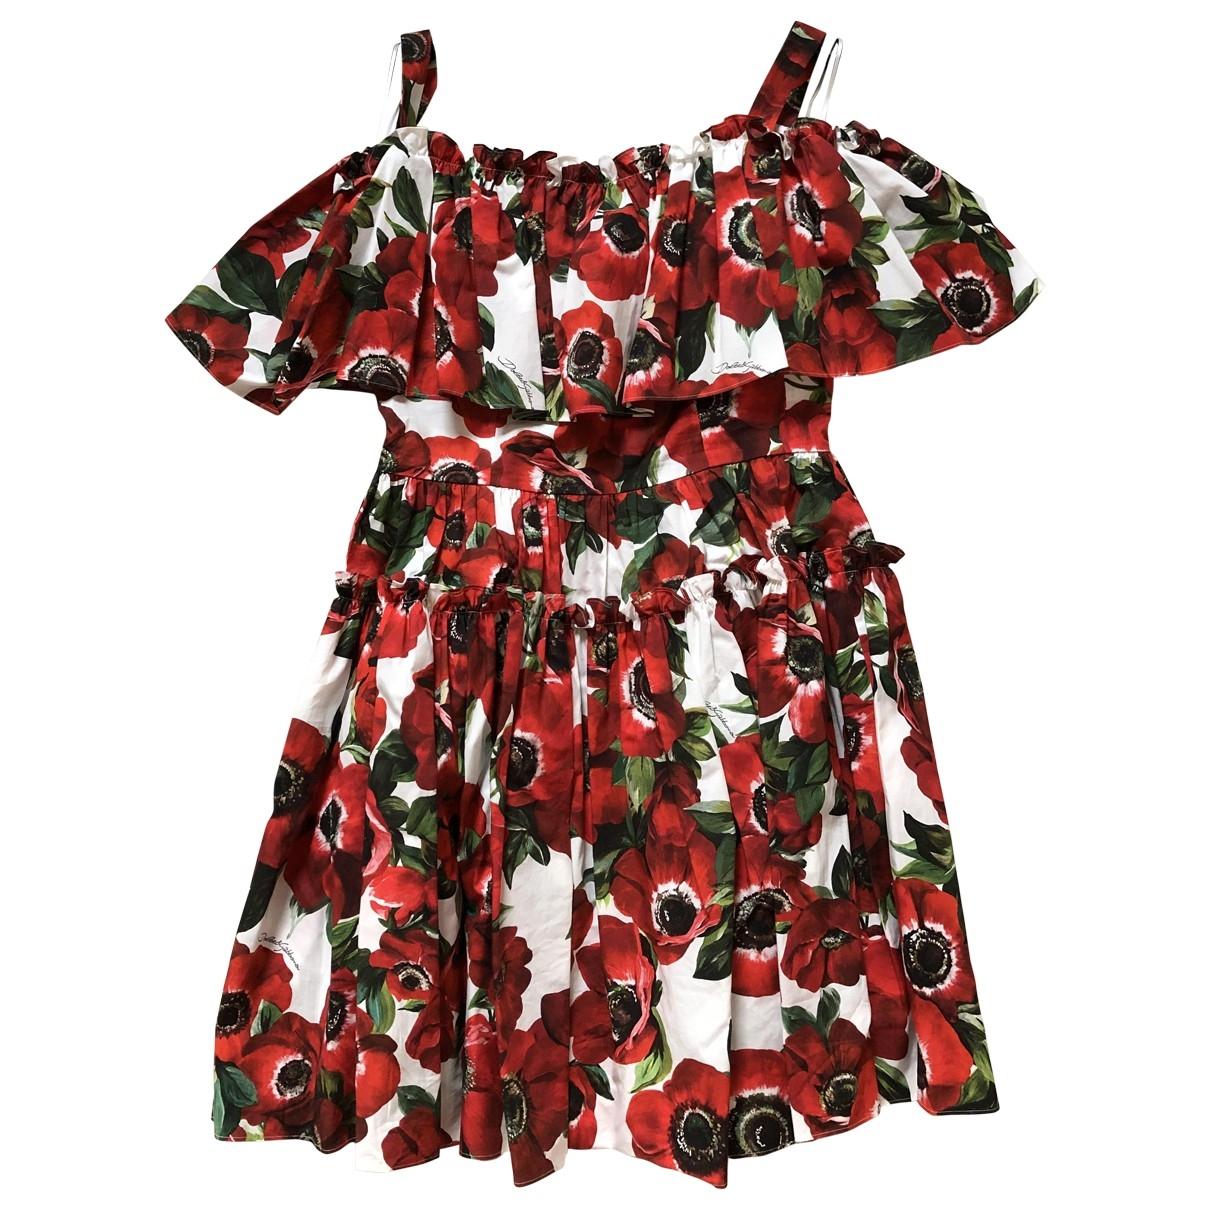 Dolce & Gabbana \N Red Cotton dress for Women 44 IT